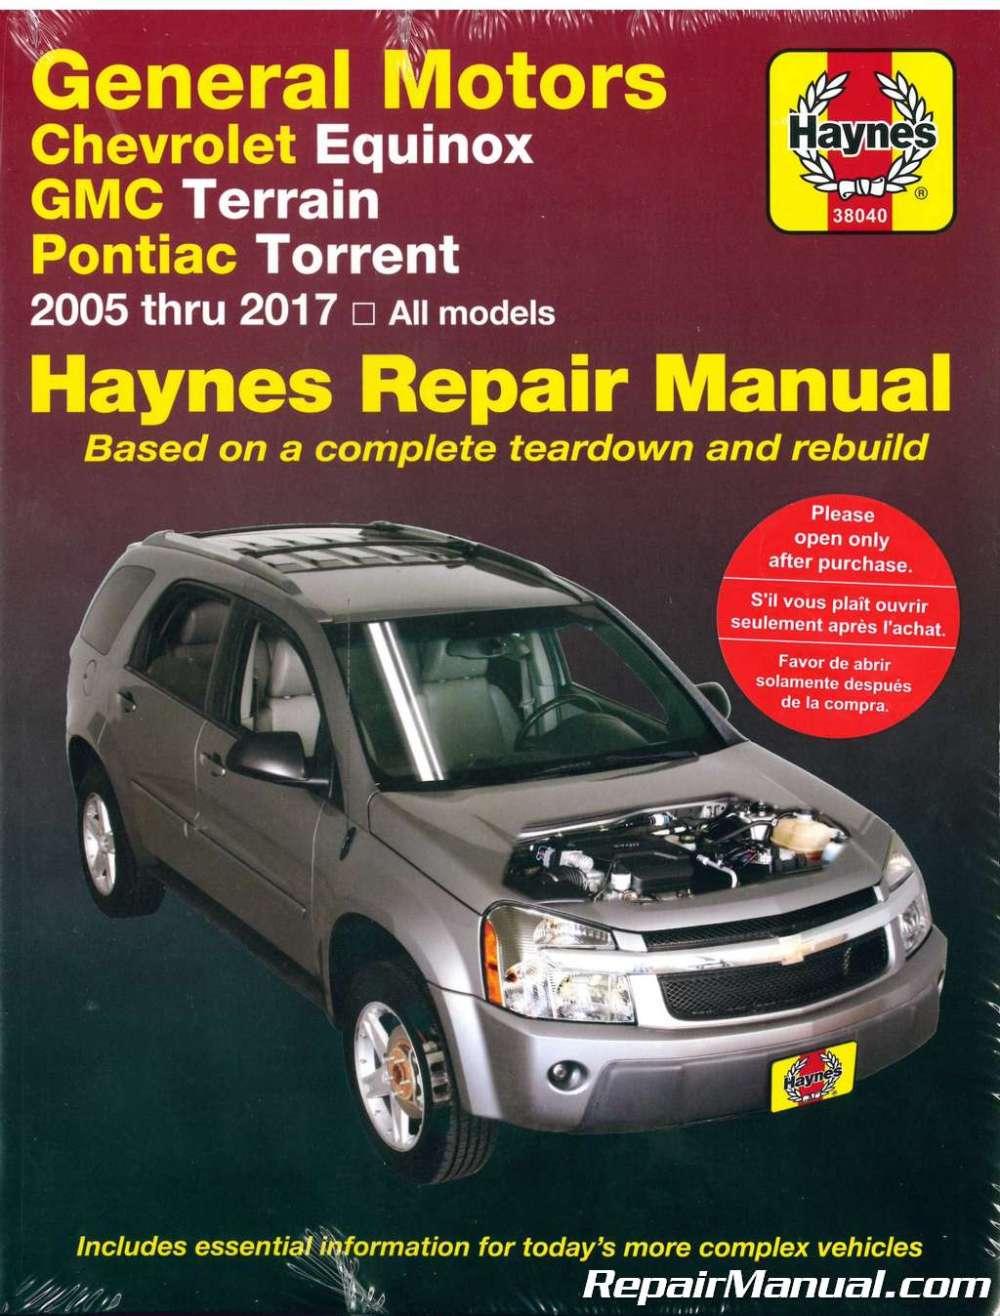 medium resolution of chevrolet equinox gmc terrain pontiac torrent 2005 2017 haynes repair manual